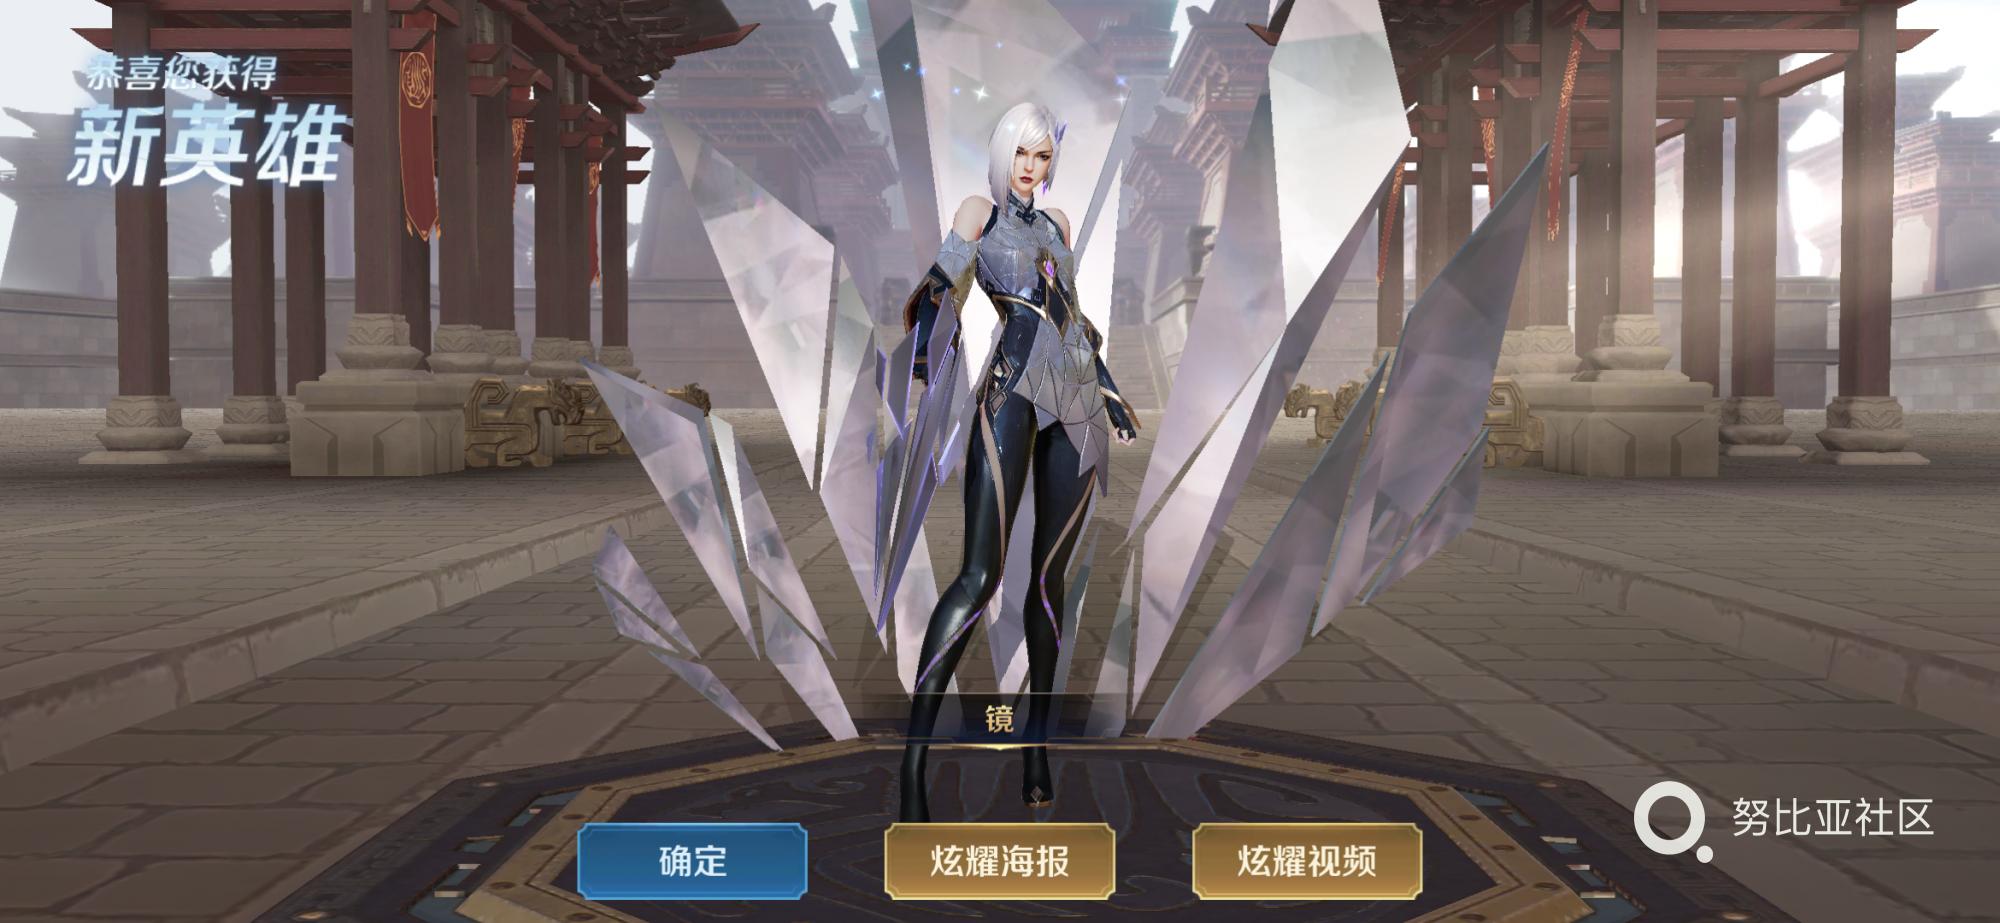 Screenshot_王者荣耀_2020-03-31-11-26-21-975.png